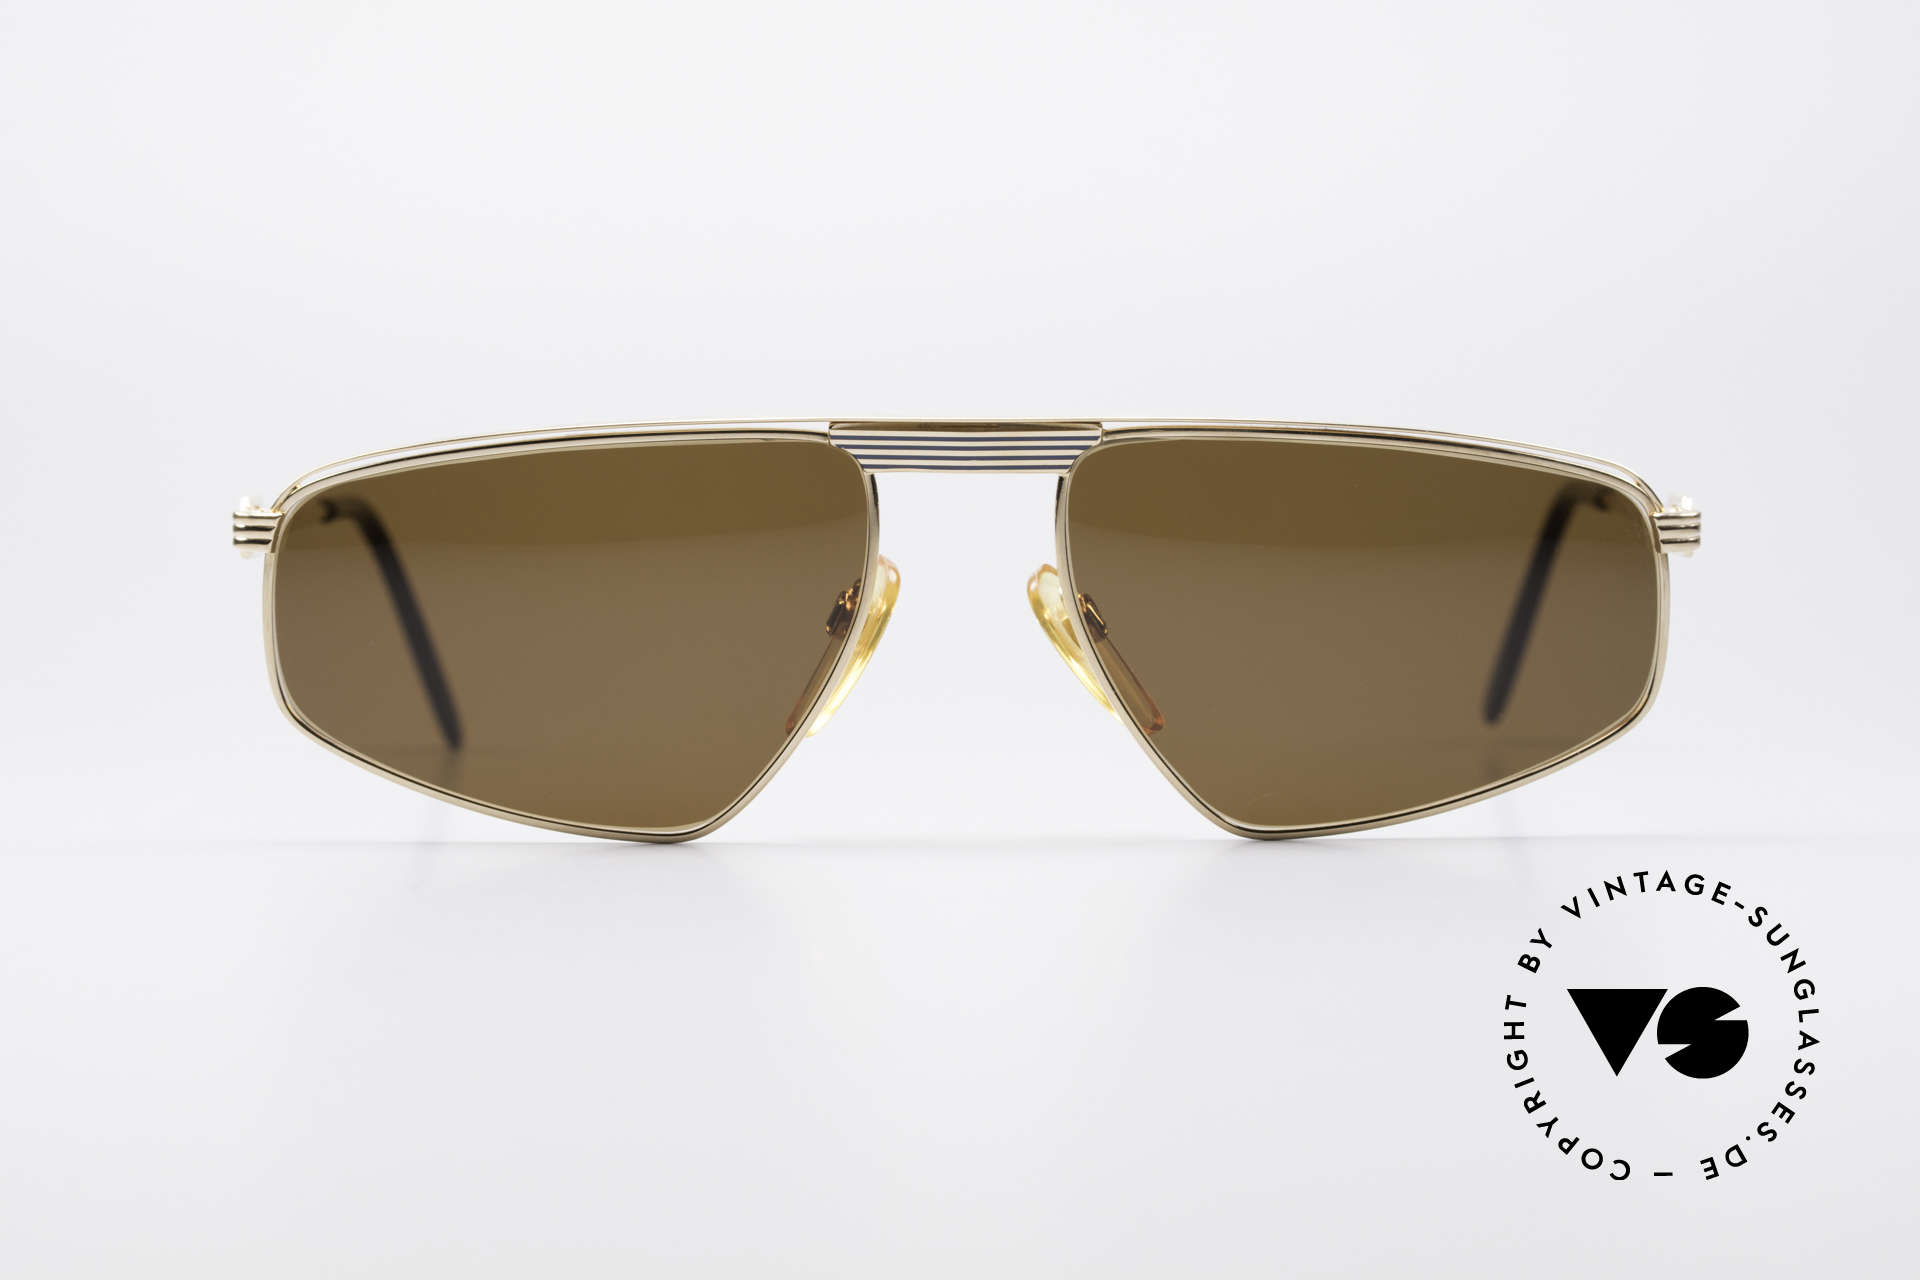 358118fe4 Sunglasses Yves Saint Laurent Asterius Designer Sunglasses   Vintage ...